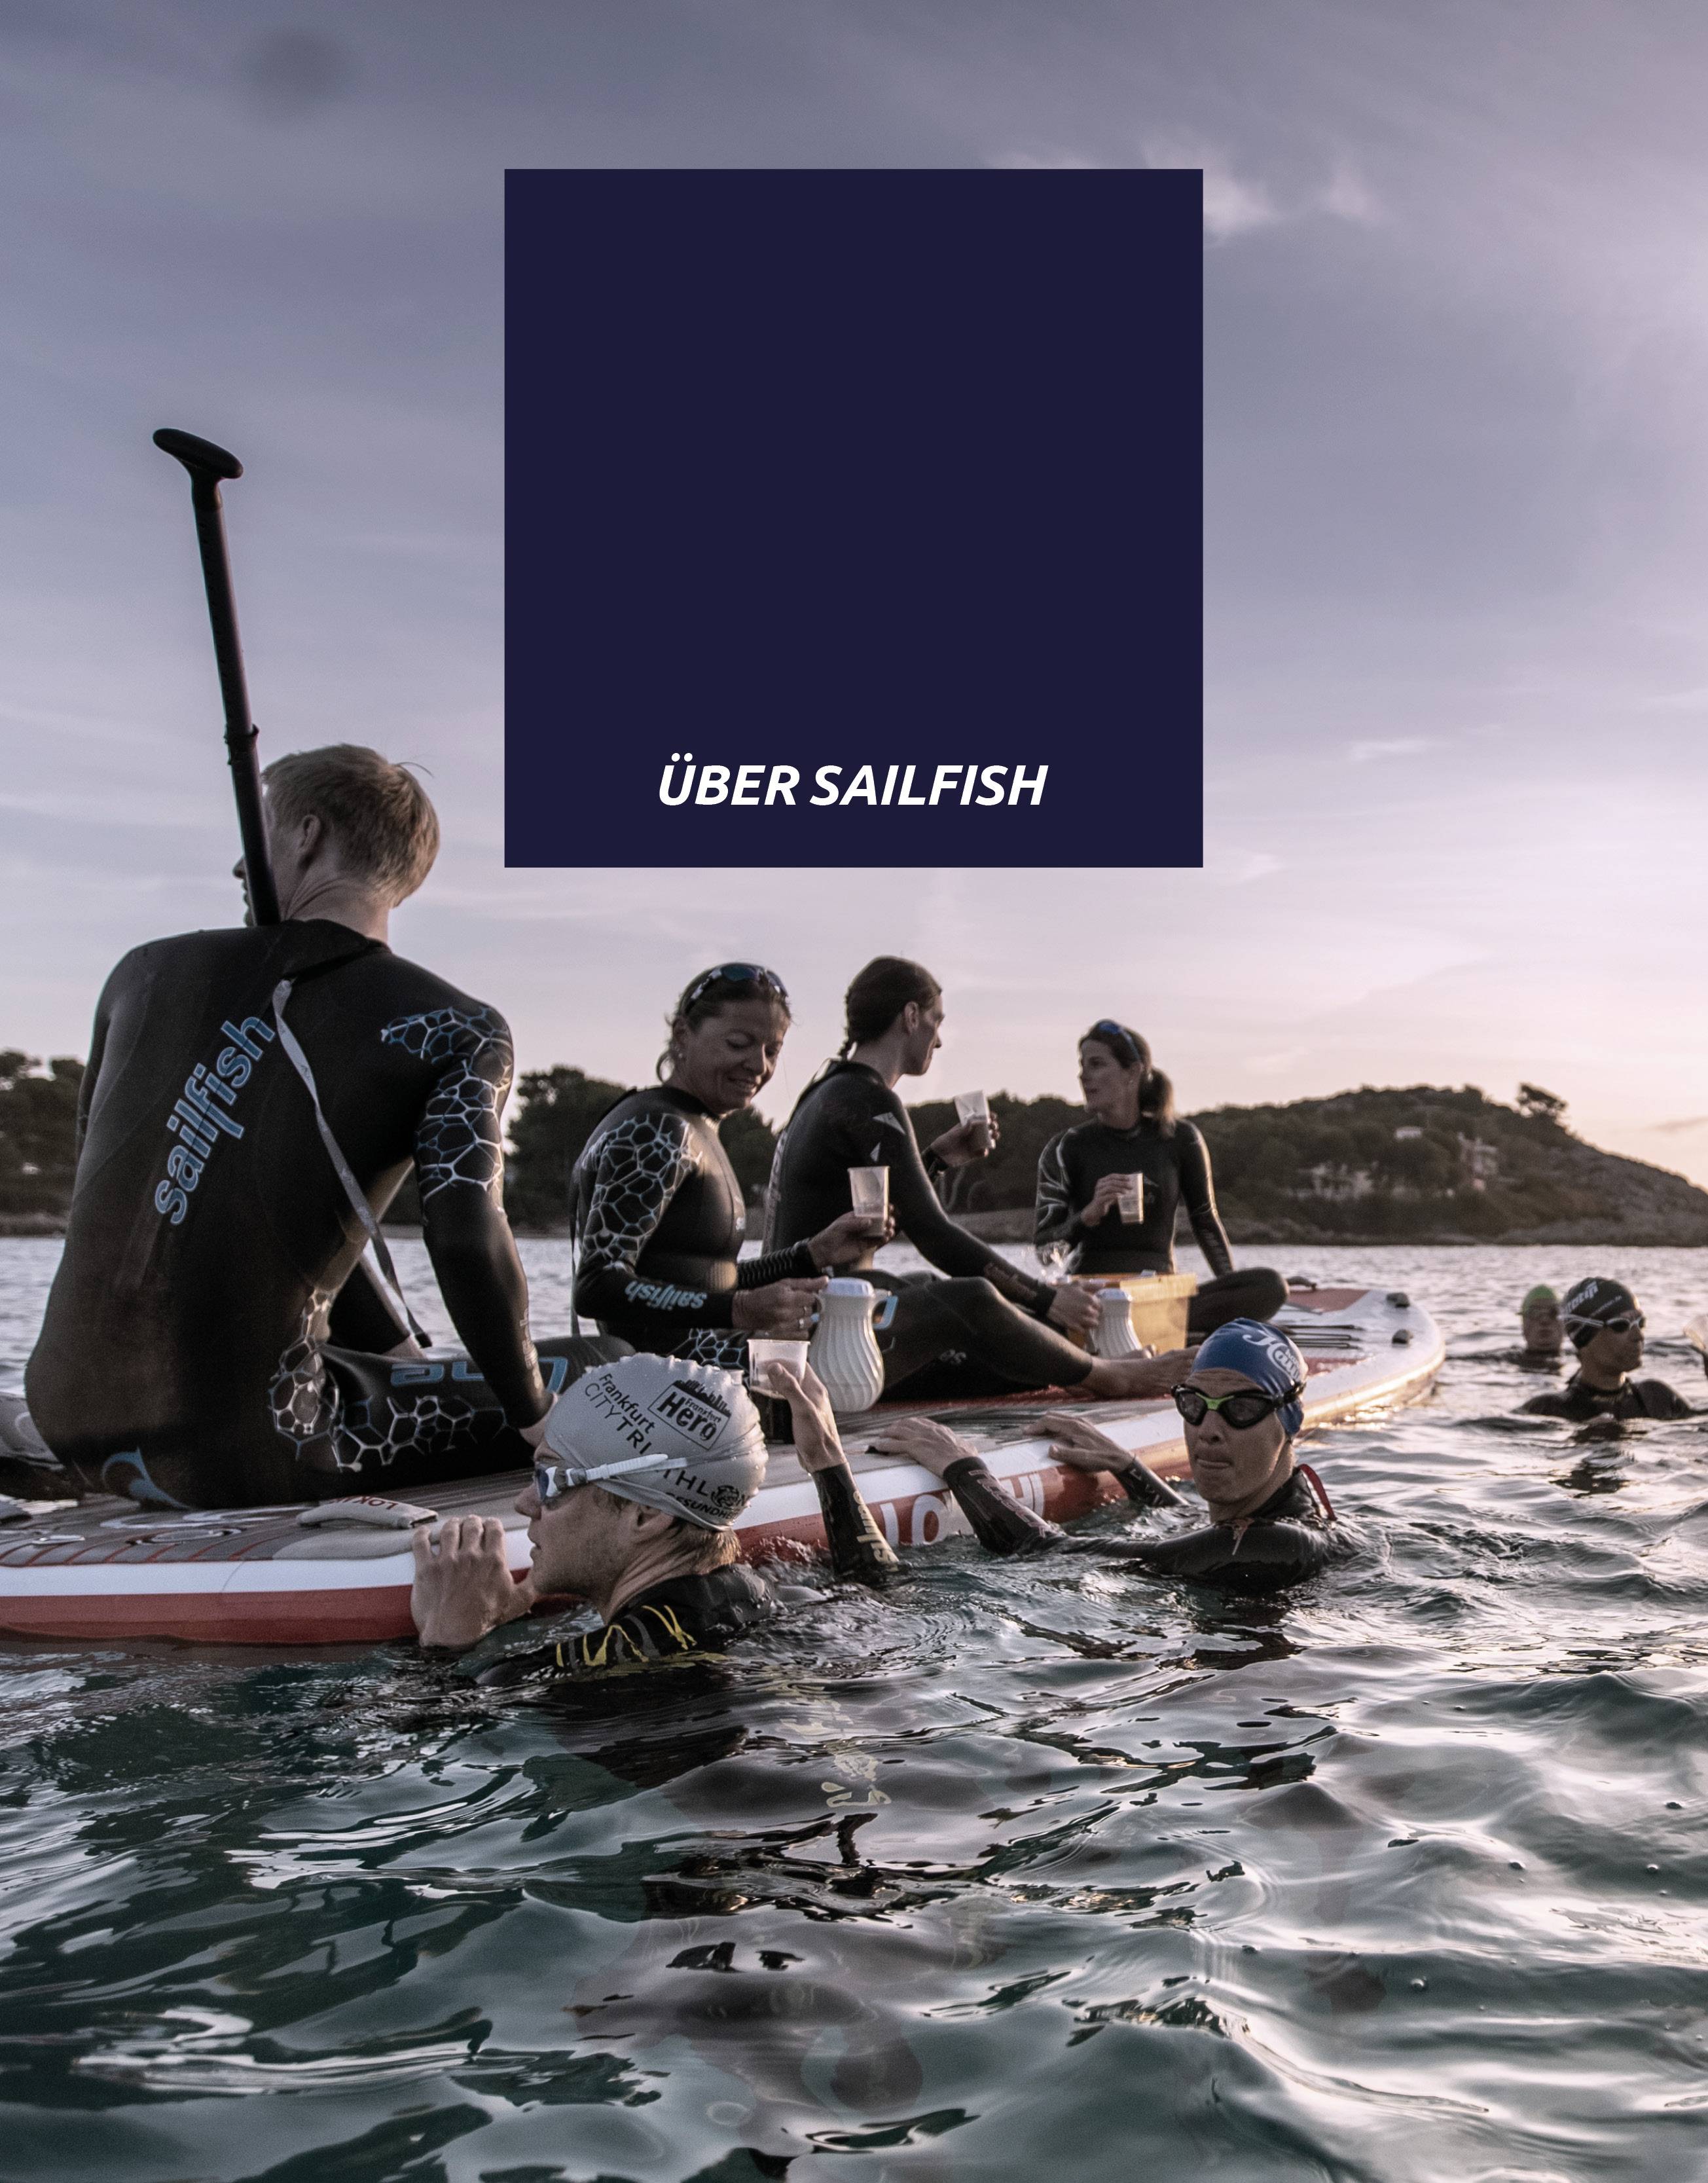 Über sailfish